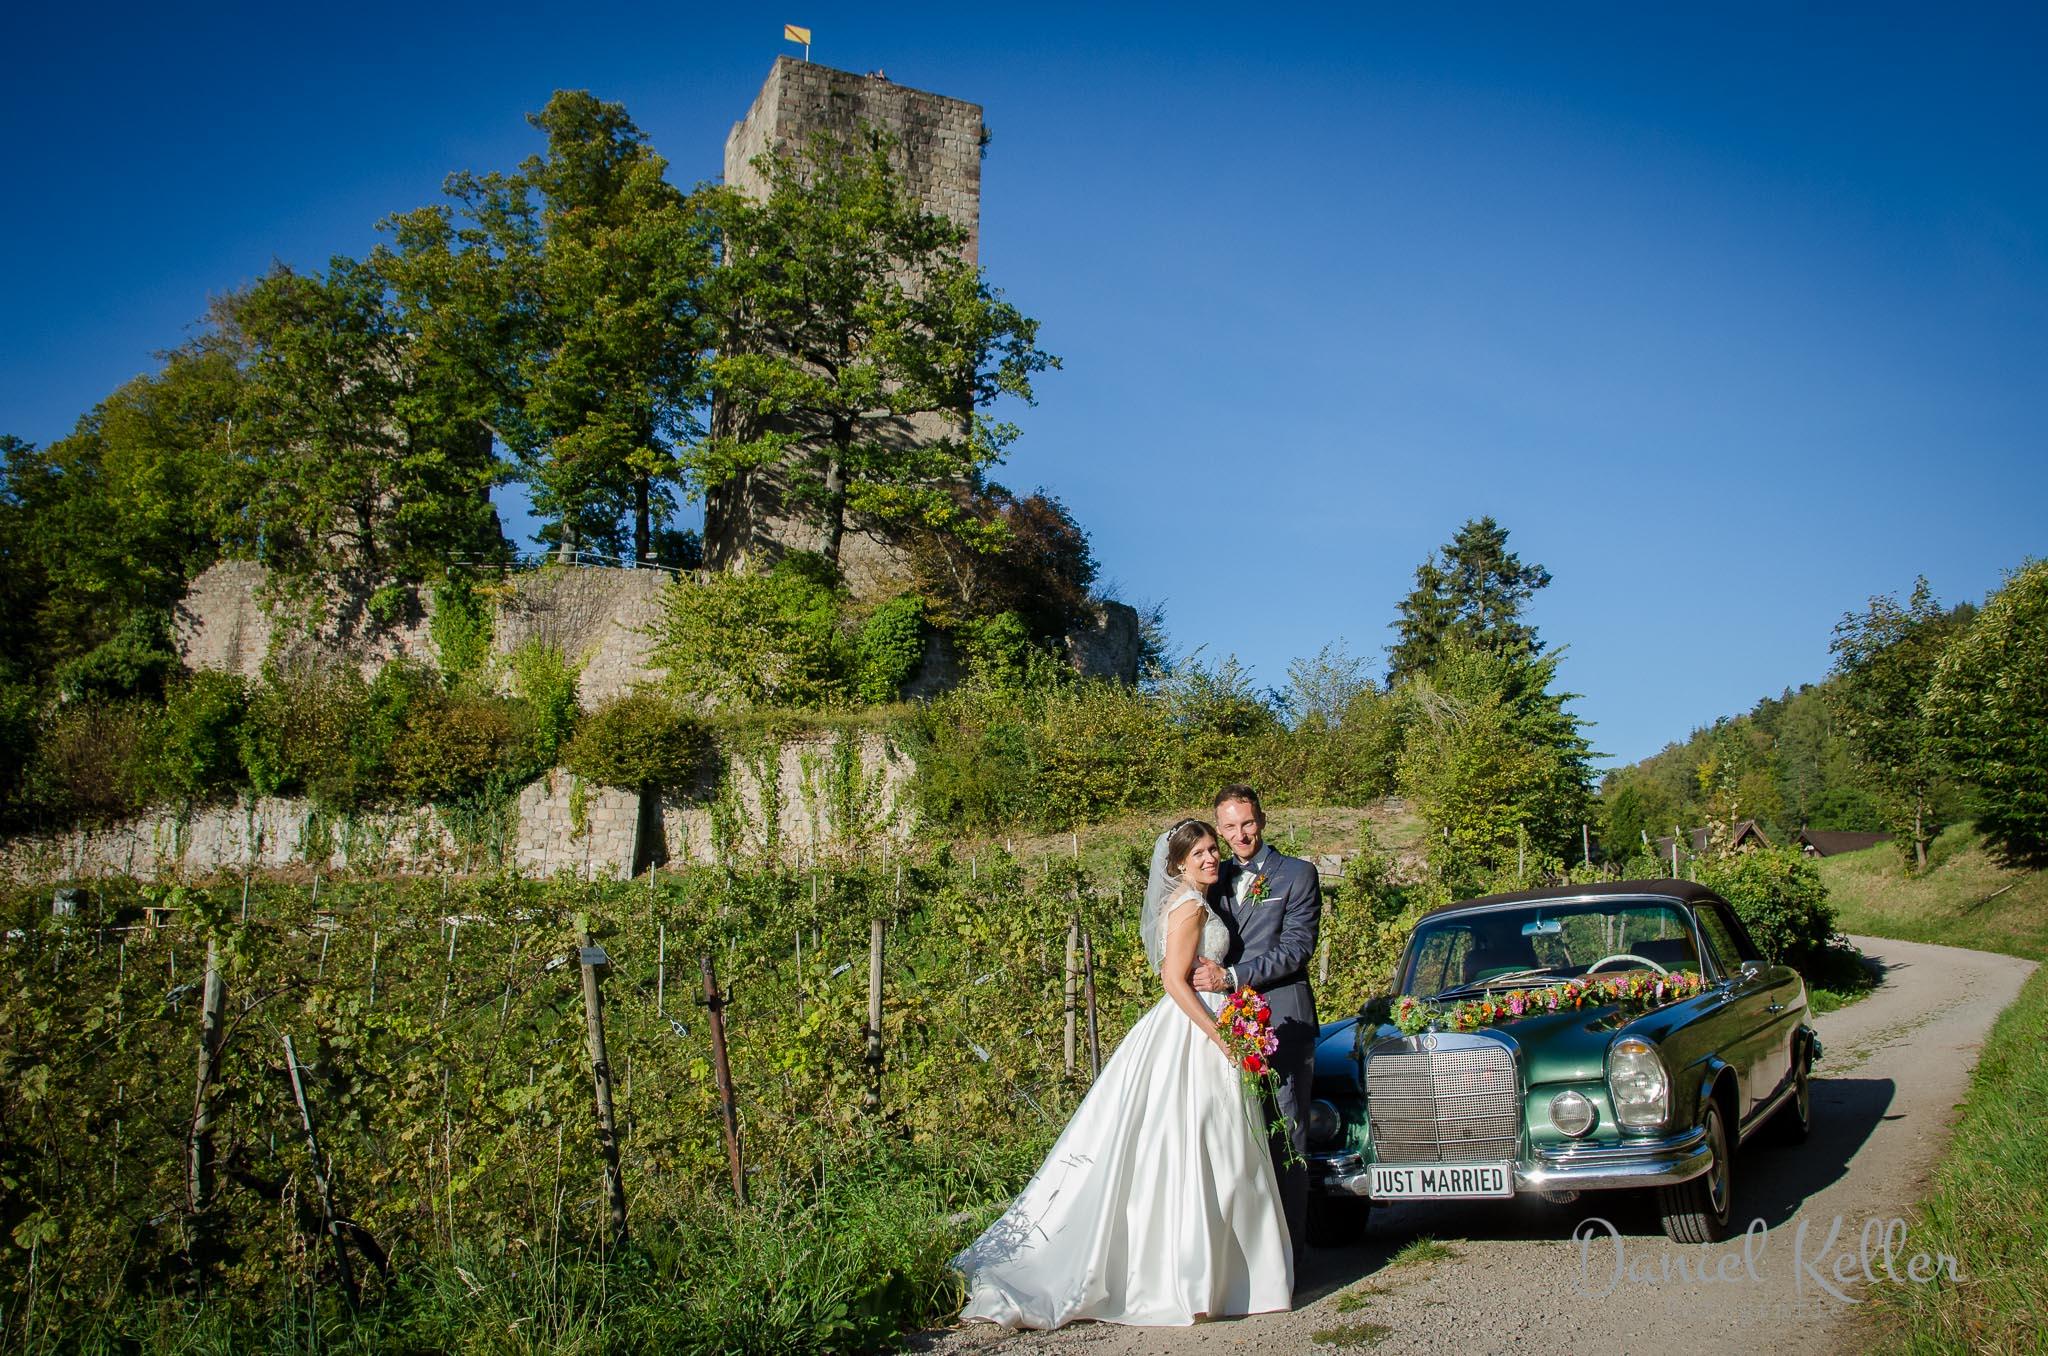 Paarhooting Burg Windeck in Bühl / Daniel Keller Hochzeitsfotograf